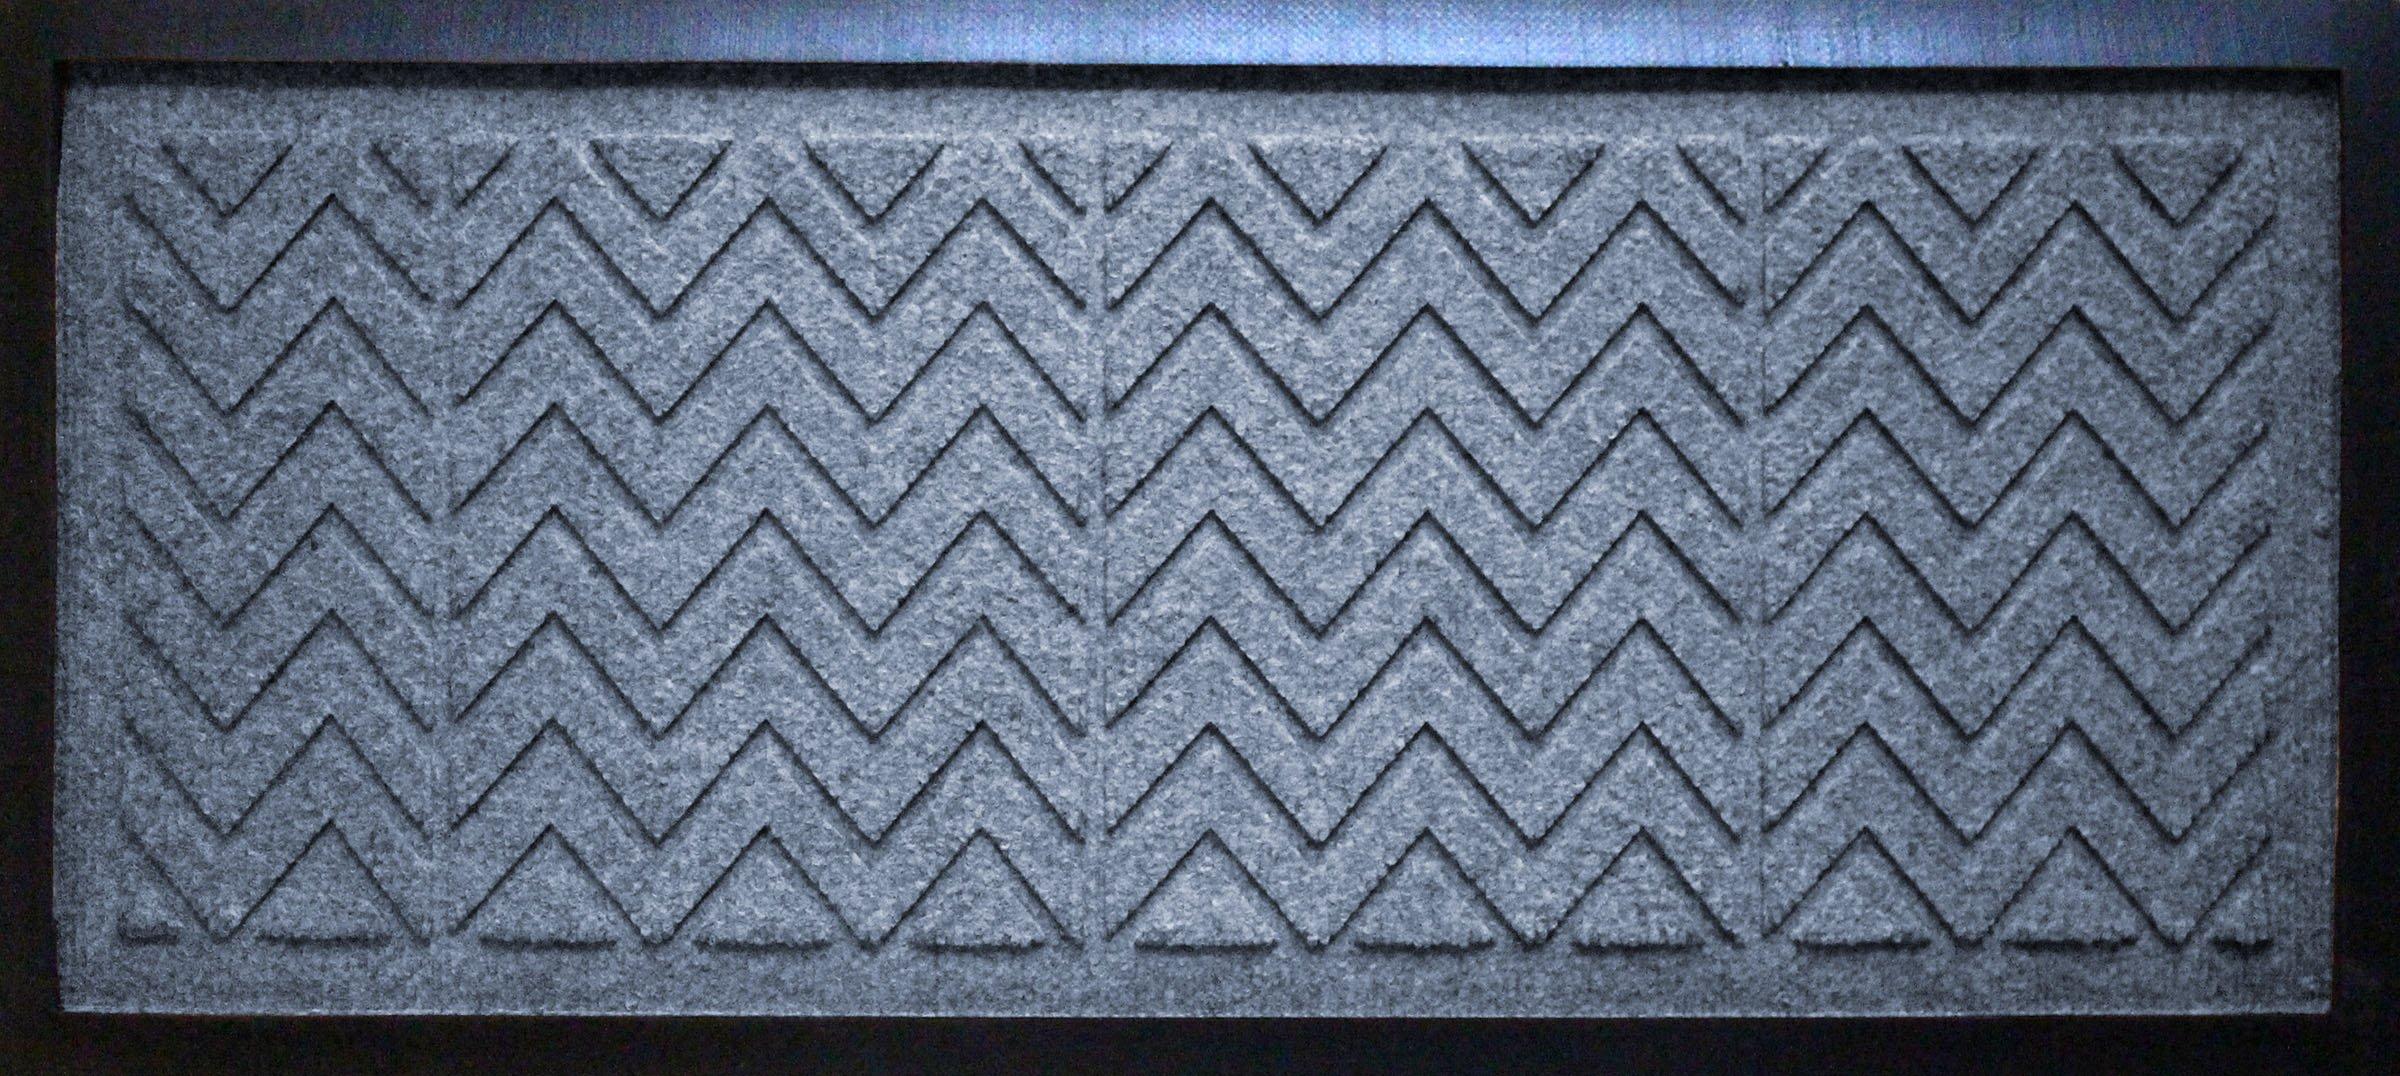 AquaShield Chevron Boot Tray Mat, 15'' x 36'', Bluestone